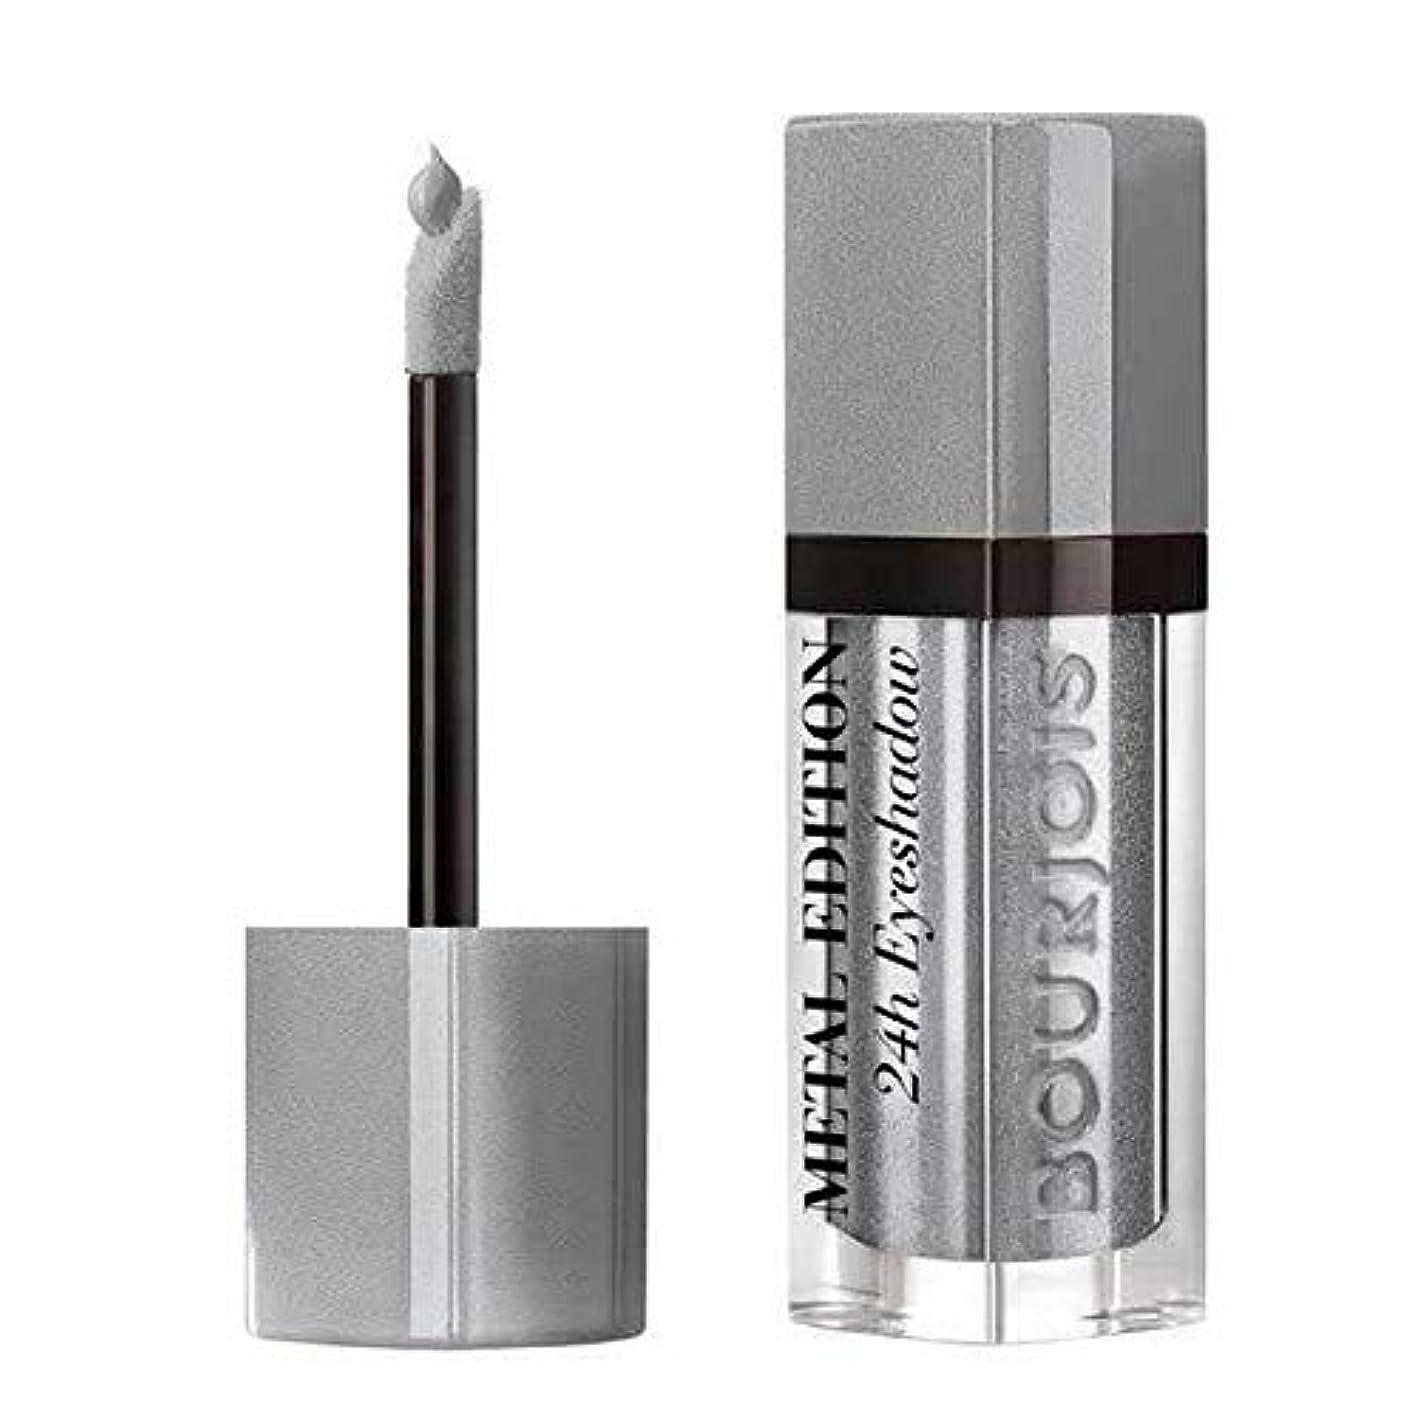 [Bourjois ] 液体アイシャドウの鉄女24時間ブルジョワ金属版 - Bourjois Metal Edition 24HR Liquid Eyeshadow Iron Woman [並行輸入品]